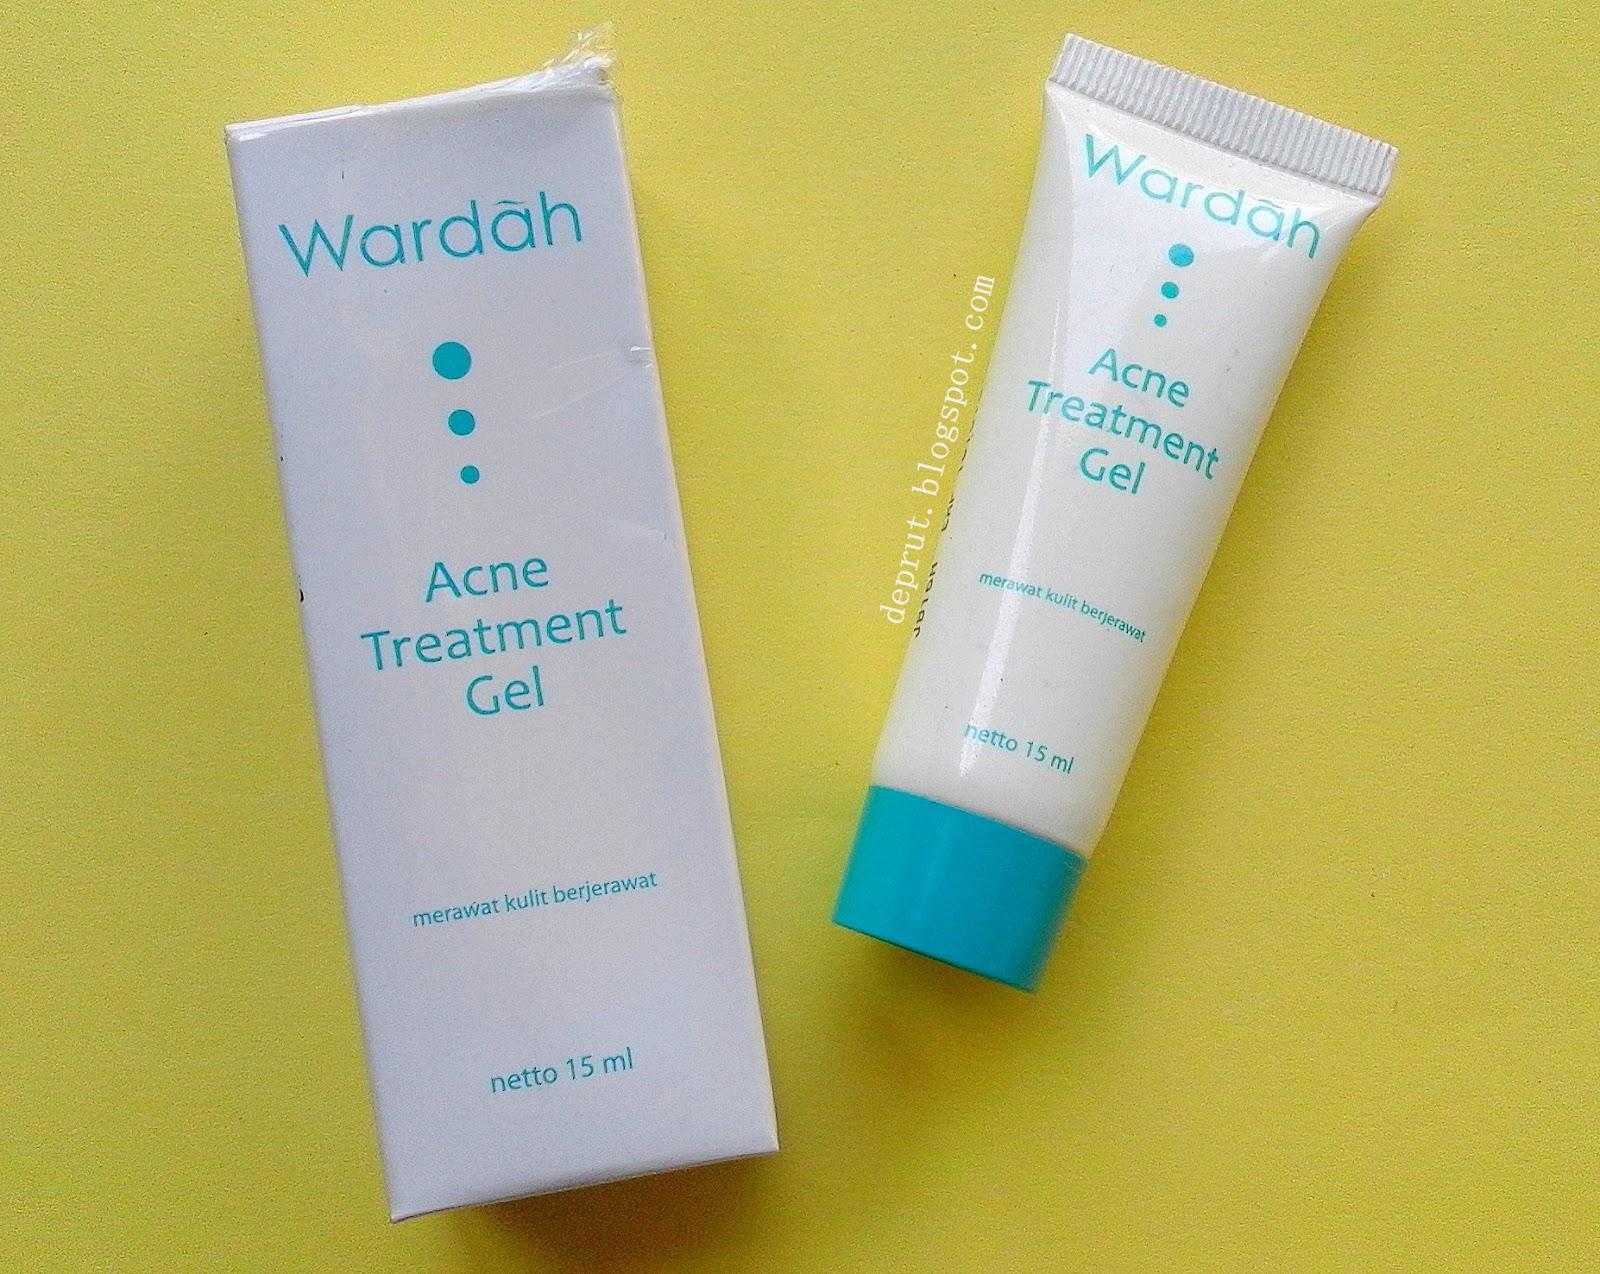 Devi Purwati Review Wardah Acne Treatment Gel Series Paket Isi 6